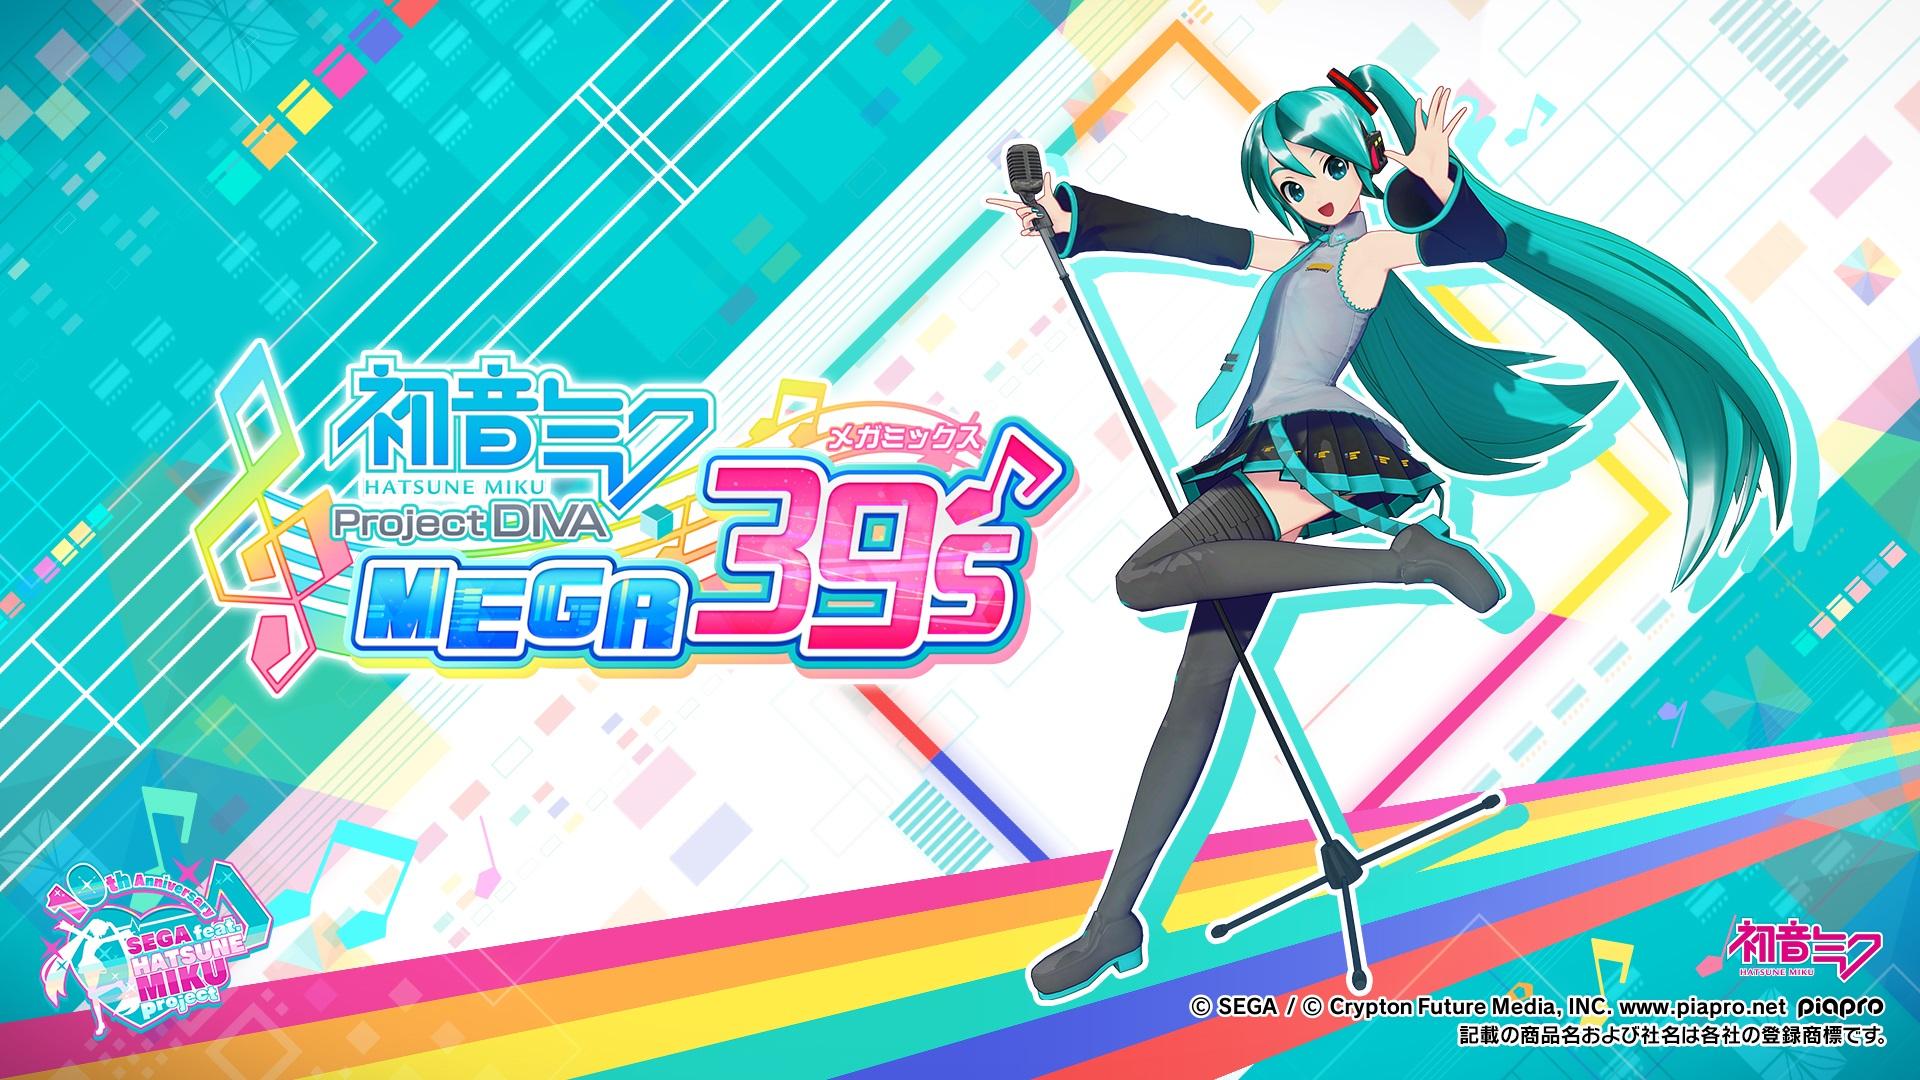 Hatsune Miku: Projeto Diva Mega39 anunciado para Switch